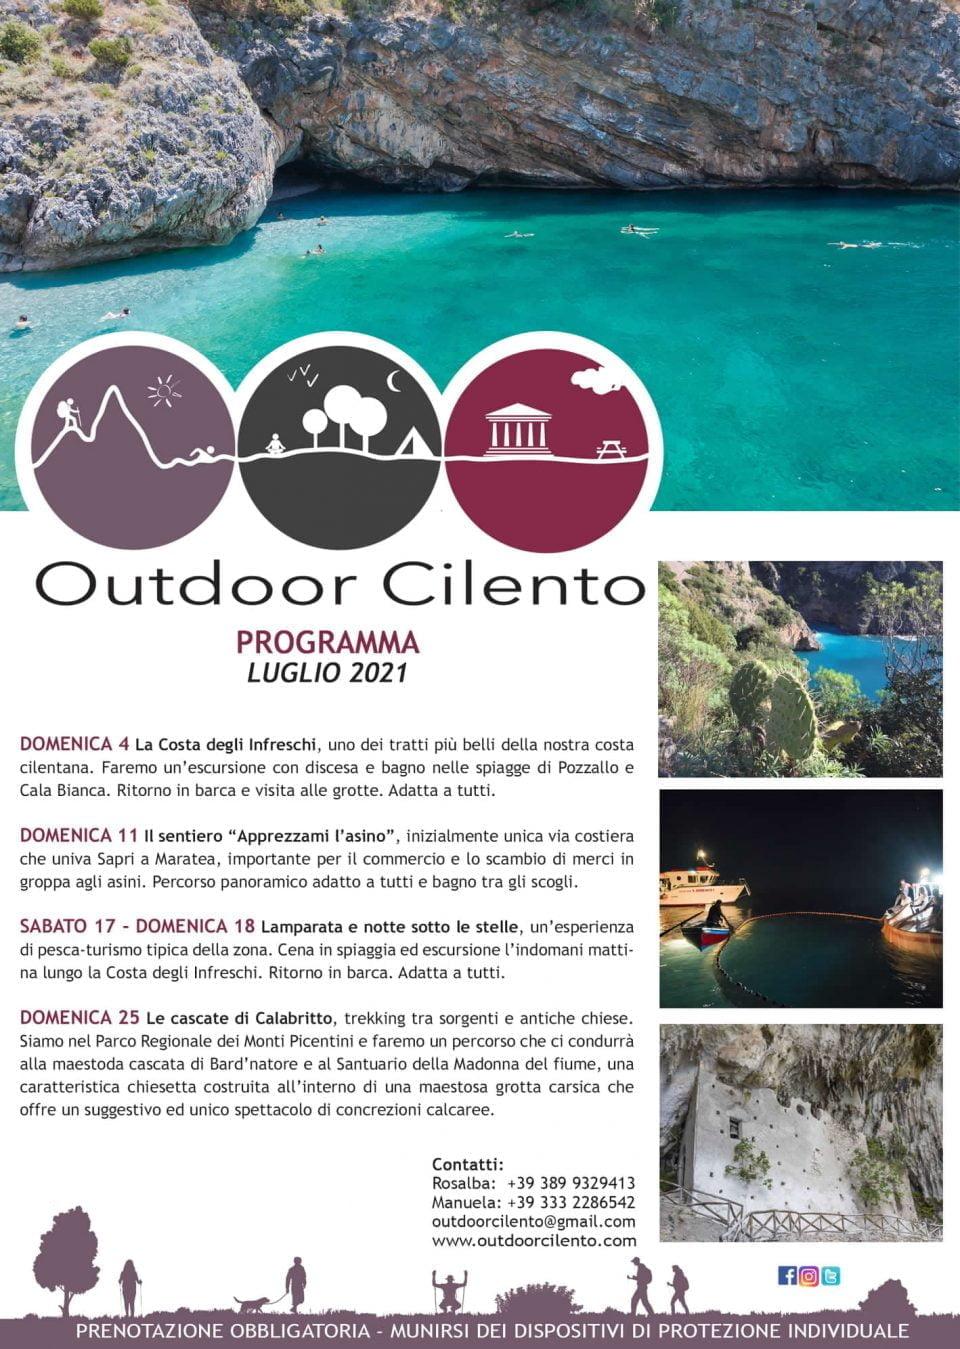 Outdoor Cilento Programma Luglio 2021 trekking Programma 960x1349 - Teggiano, Programma Luglio 2021 di Outdoor Cilento